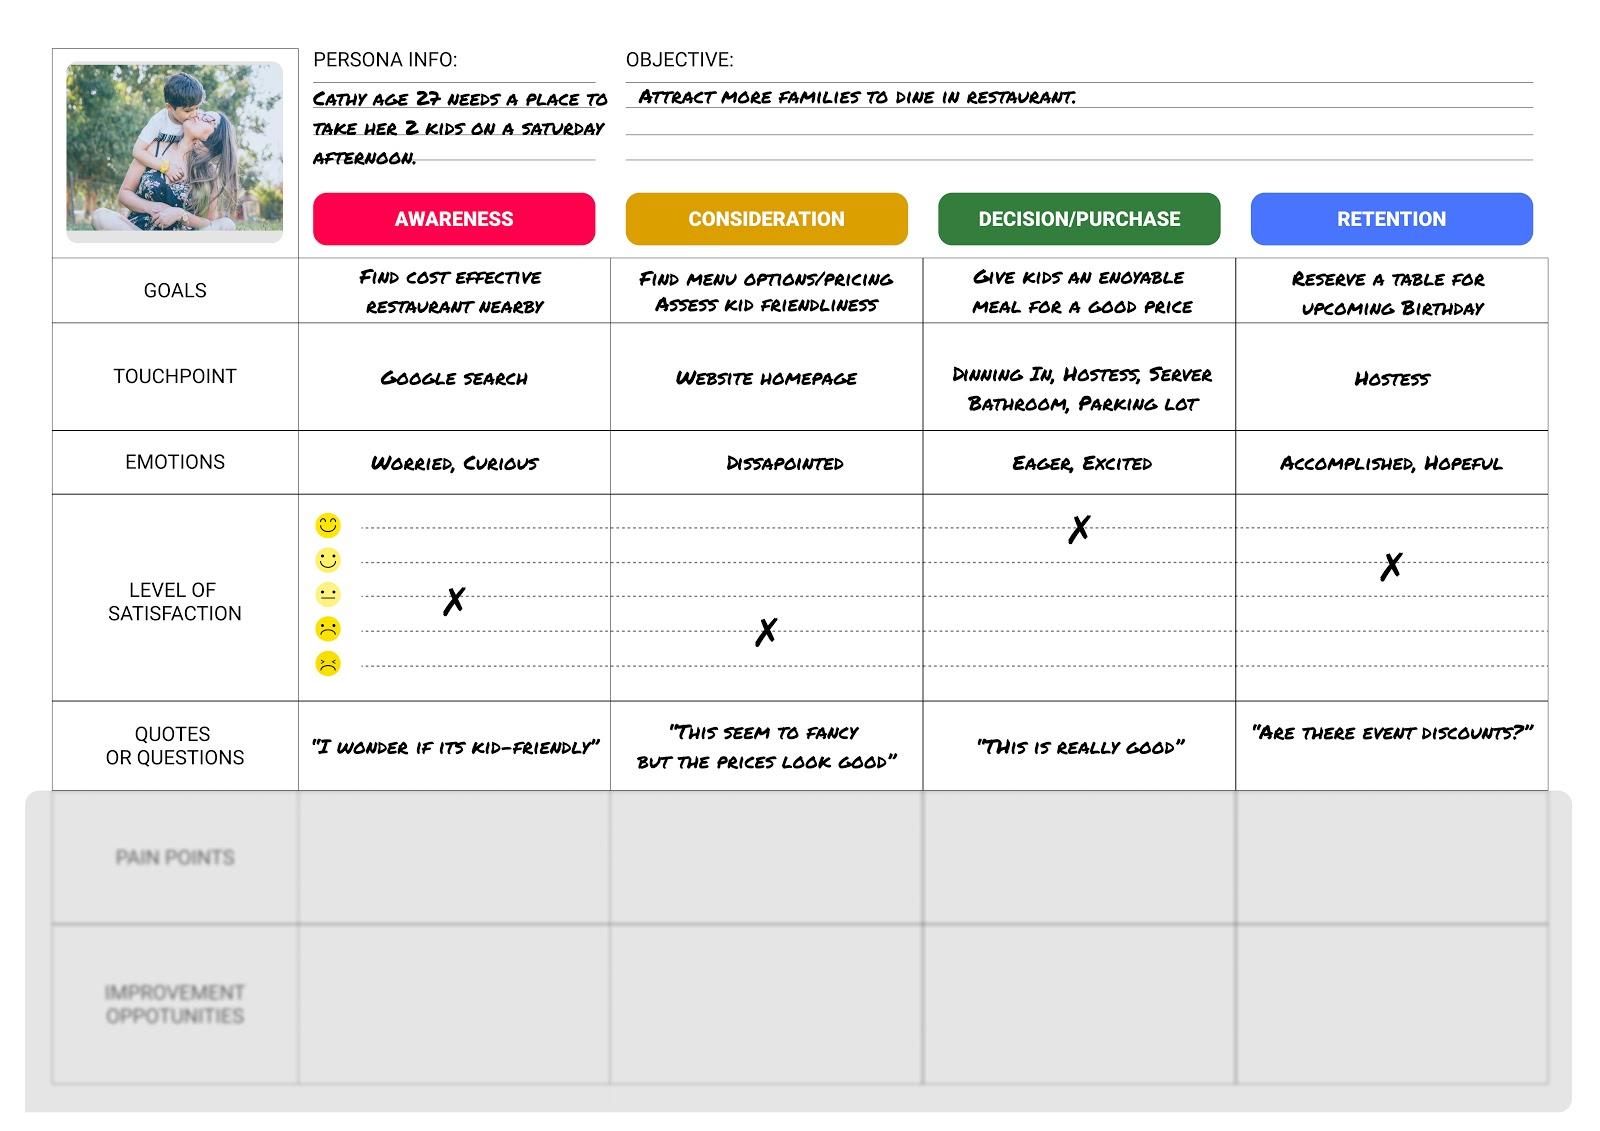 Step 5: Gather data and customer feedback